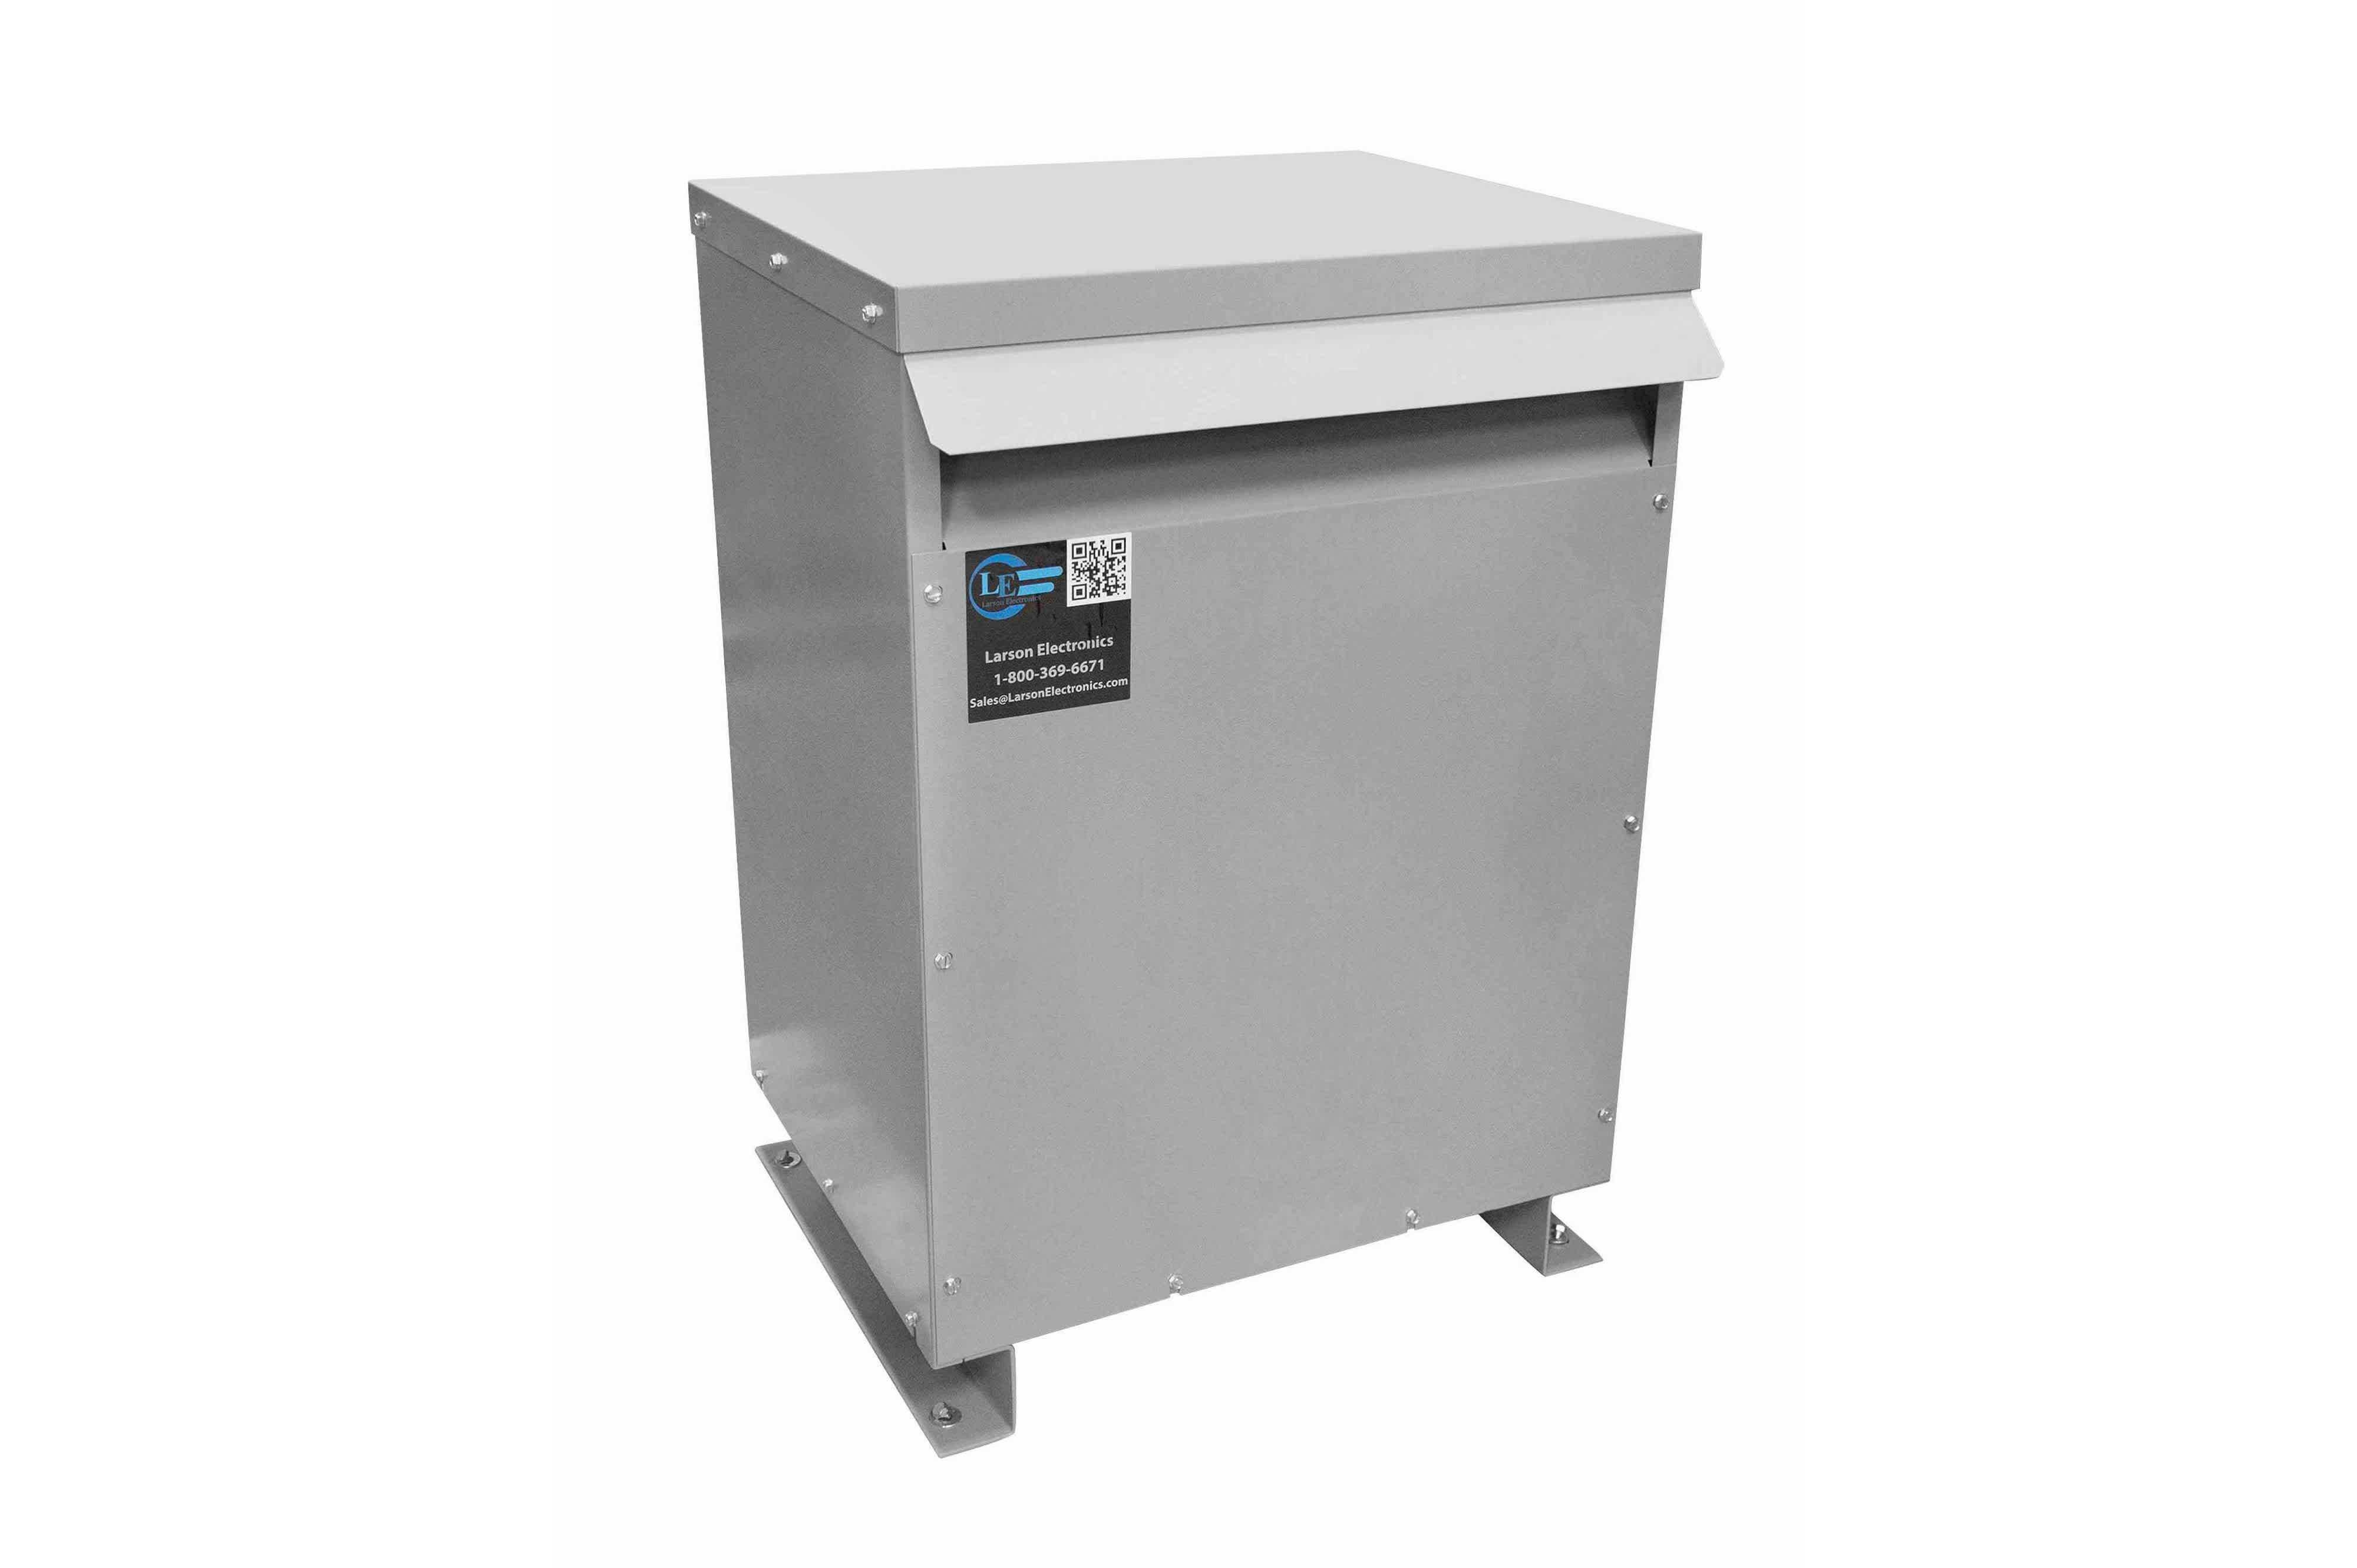 15 kVA 3PH Isolation Transformer, 240V Wye Primary, 600Y/347 Wye-N Secondary, N3R, Ventilated, 60 Hz